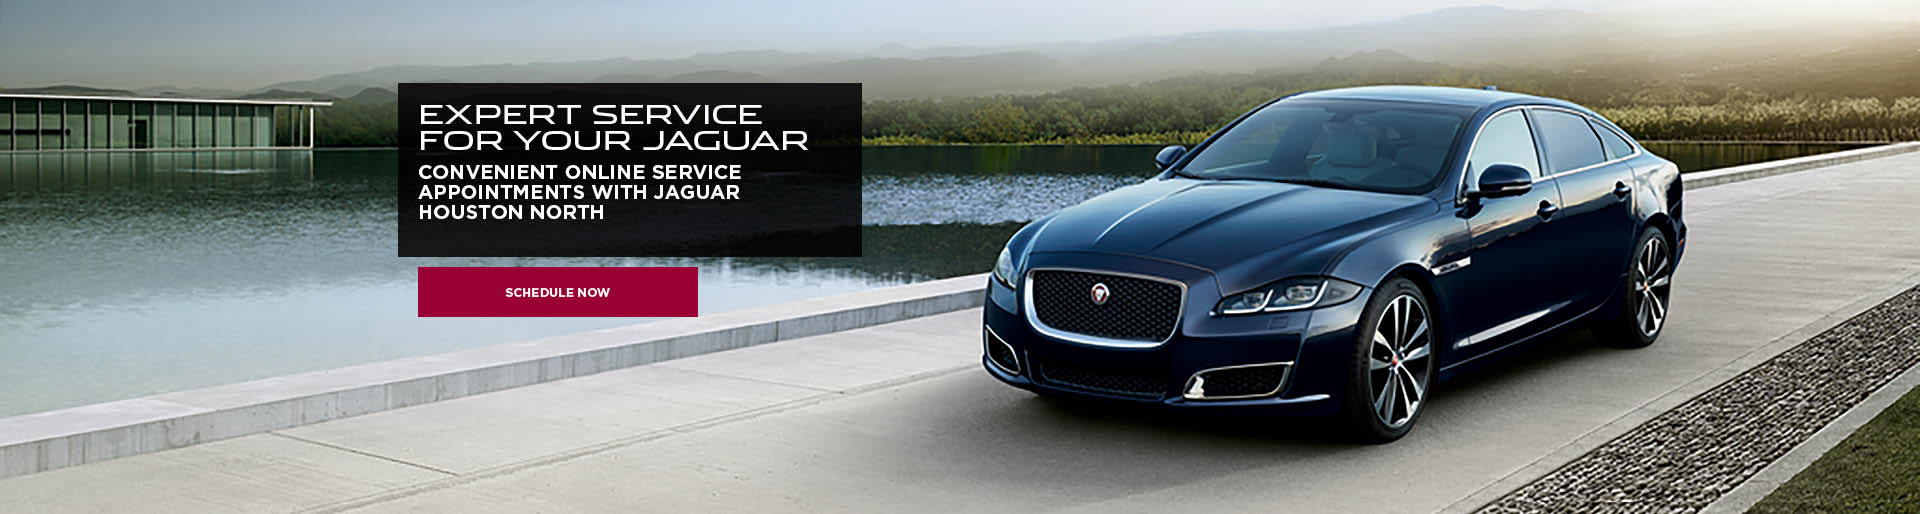 Jaguar Houston North: New & Used Luxury Car Dealer